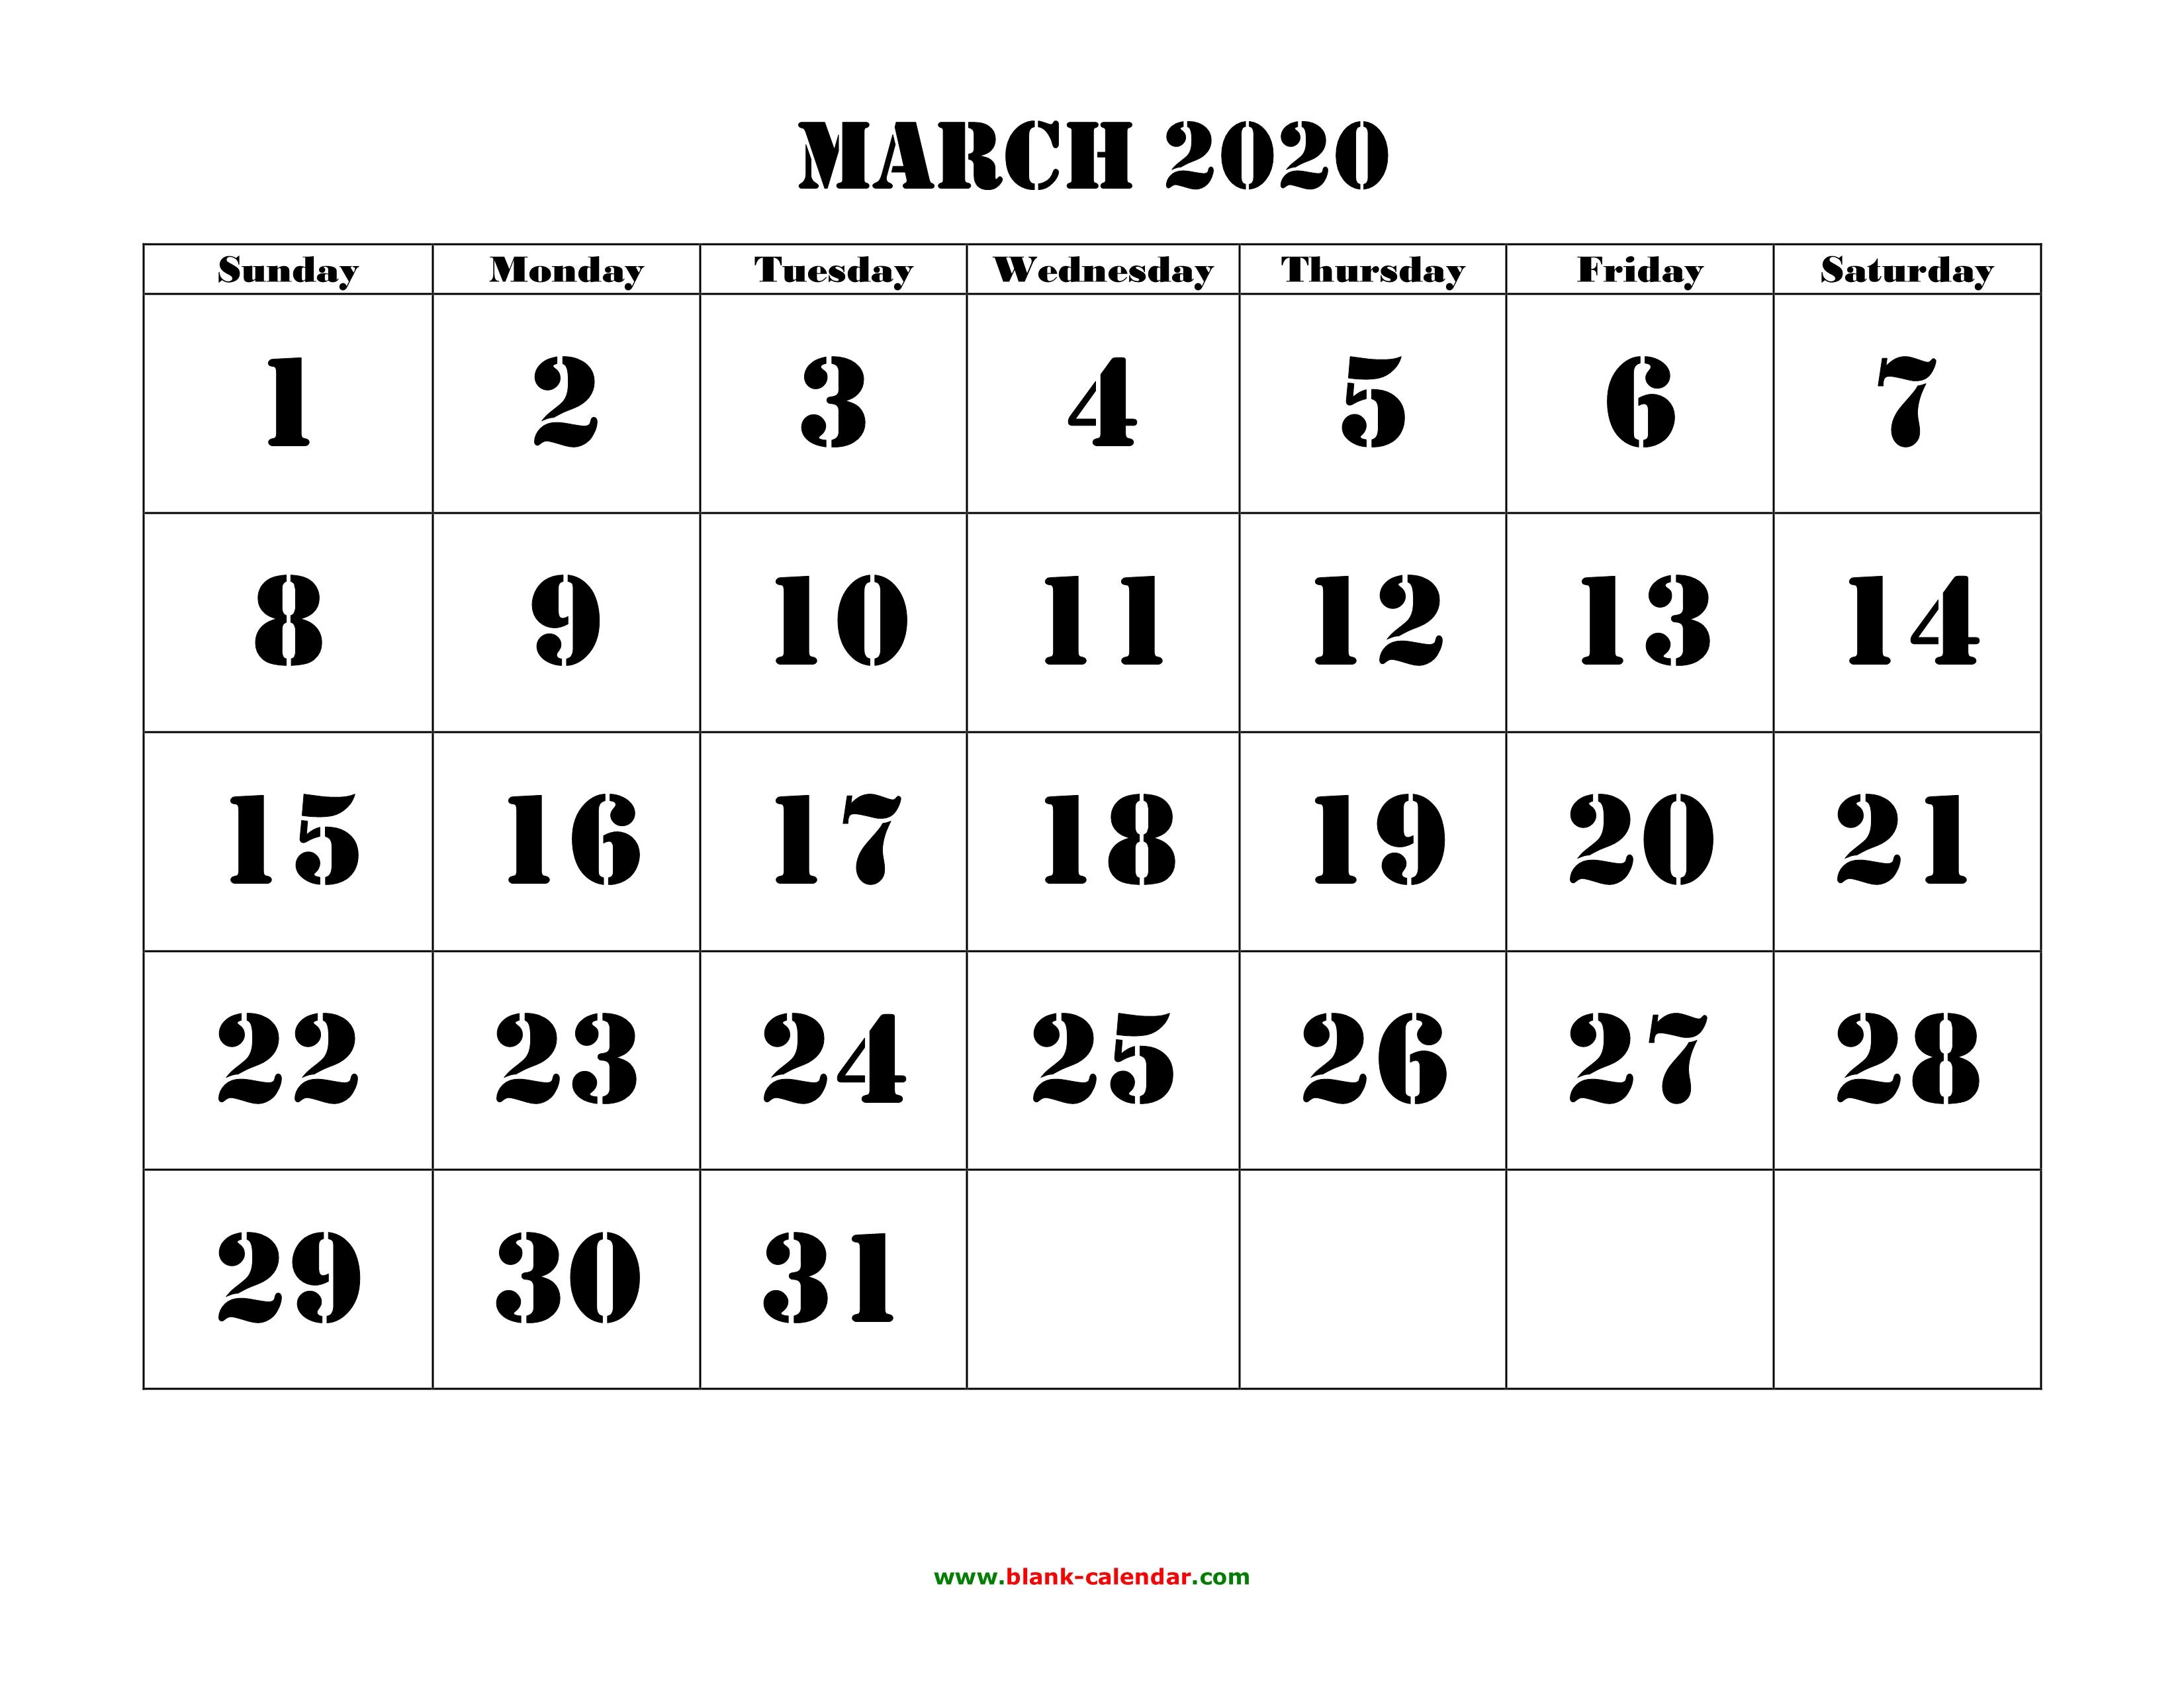 photograph regarding March Calendar Printable named March 2020 Printable Calendar Totally free Obtain Every month